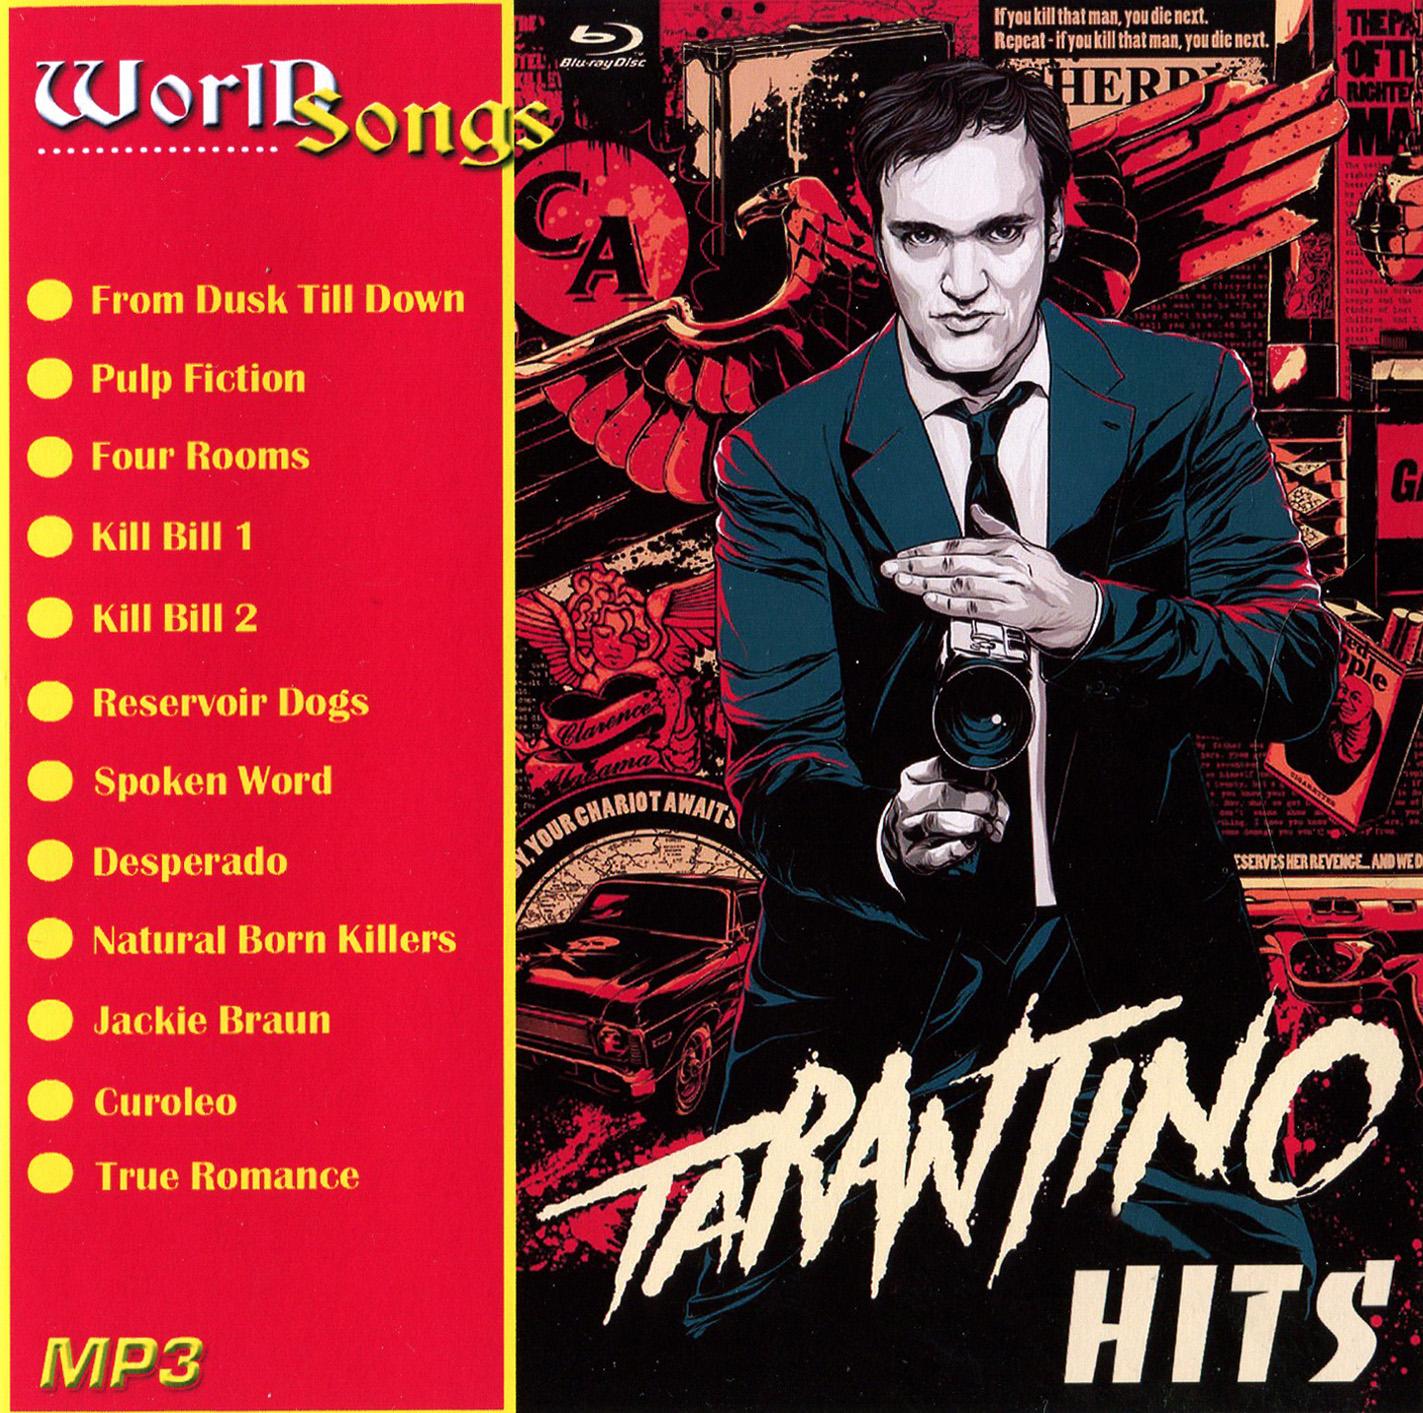 Tarantino Hits [mp3]